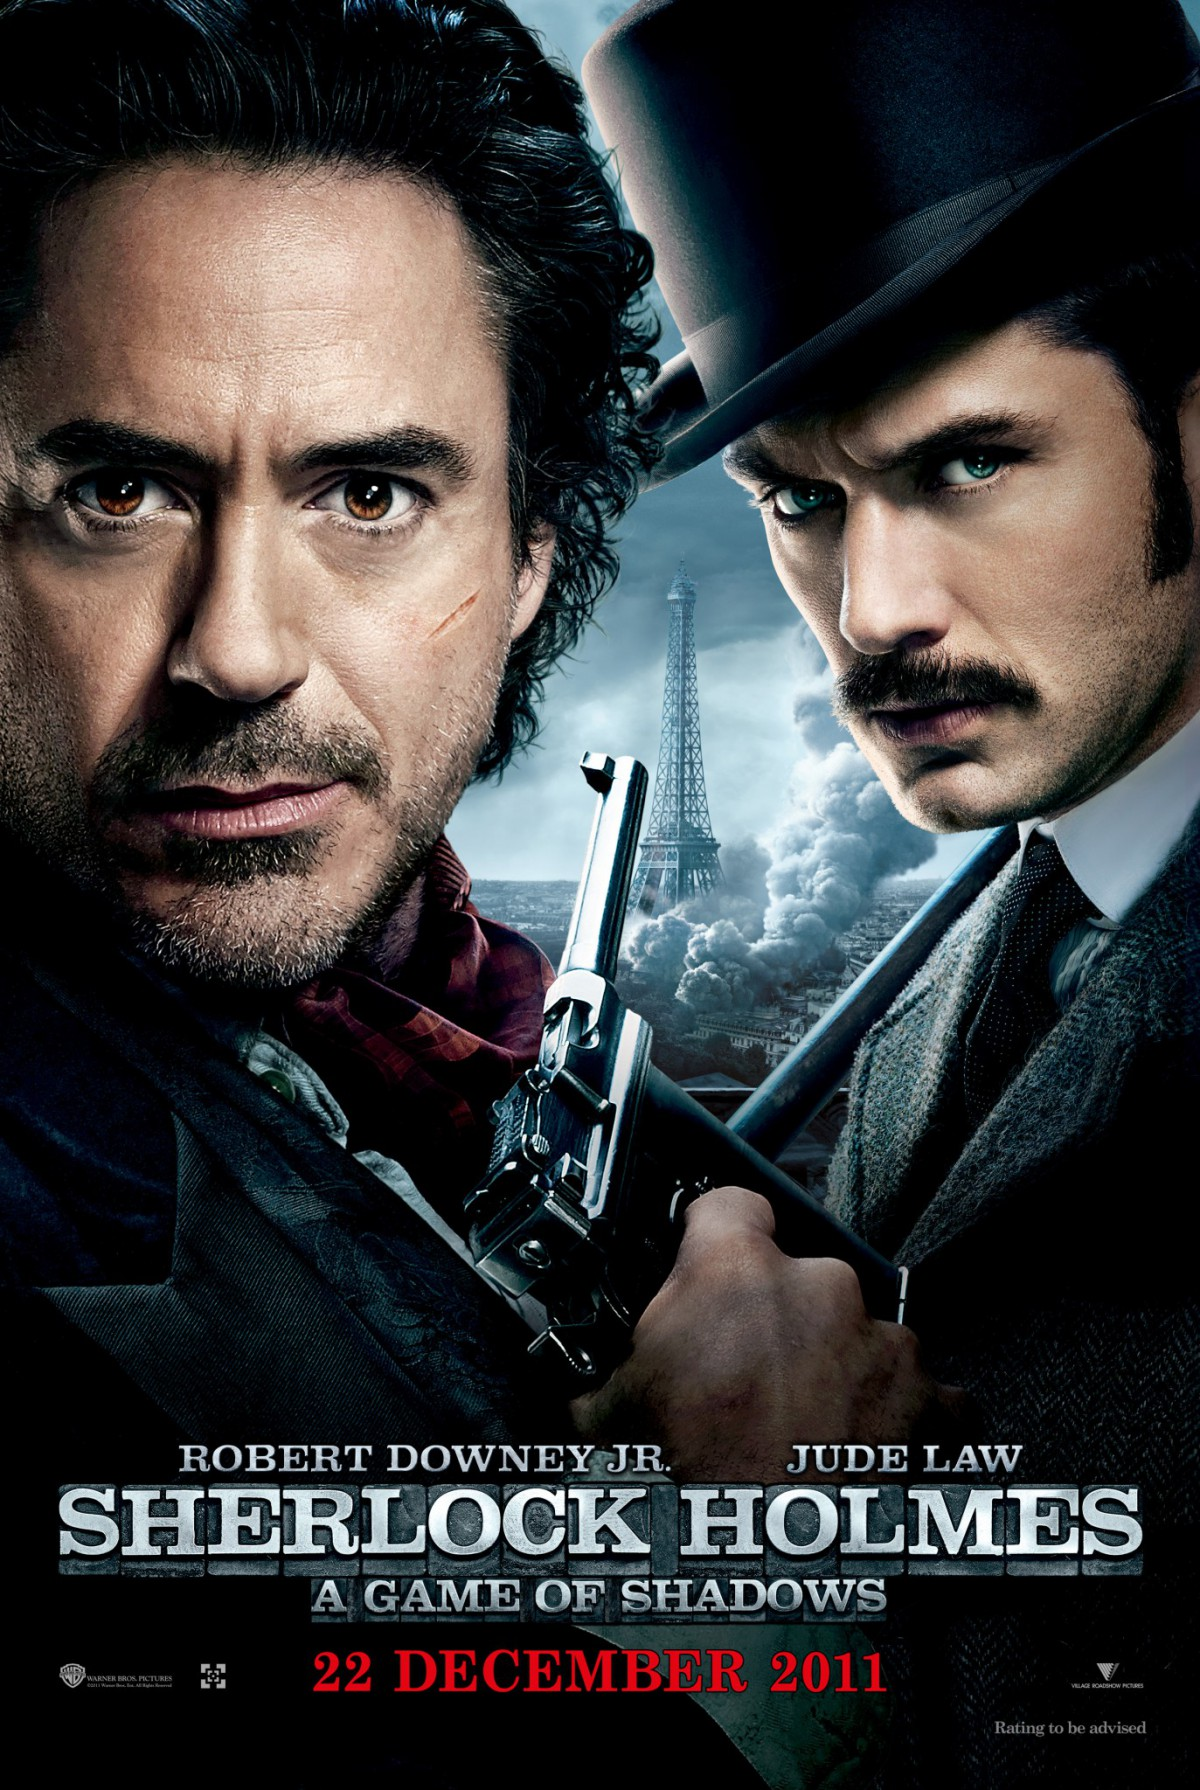 Sherlock Holmes Game of Shadows